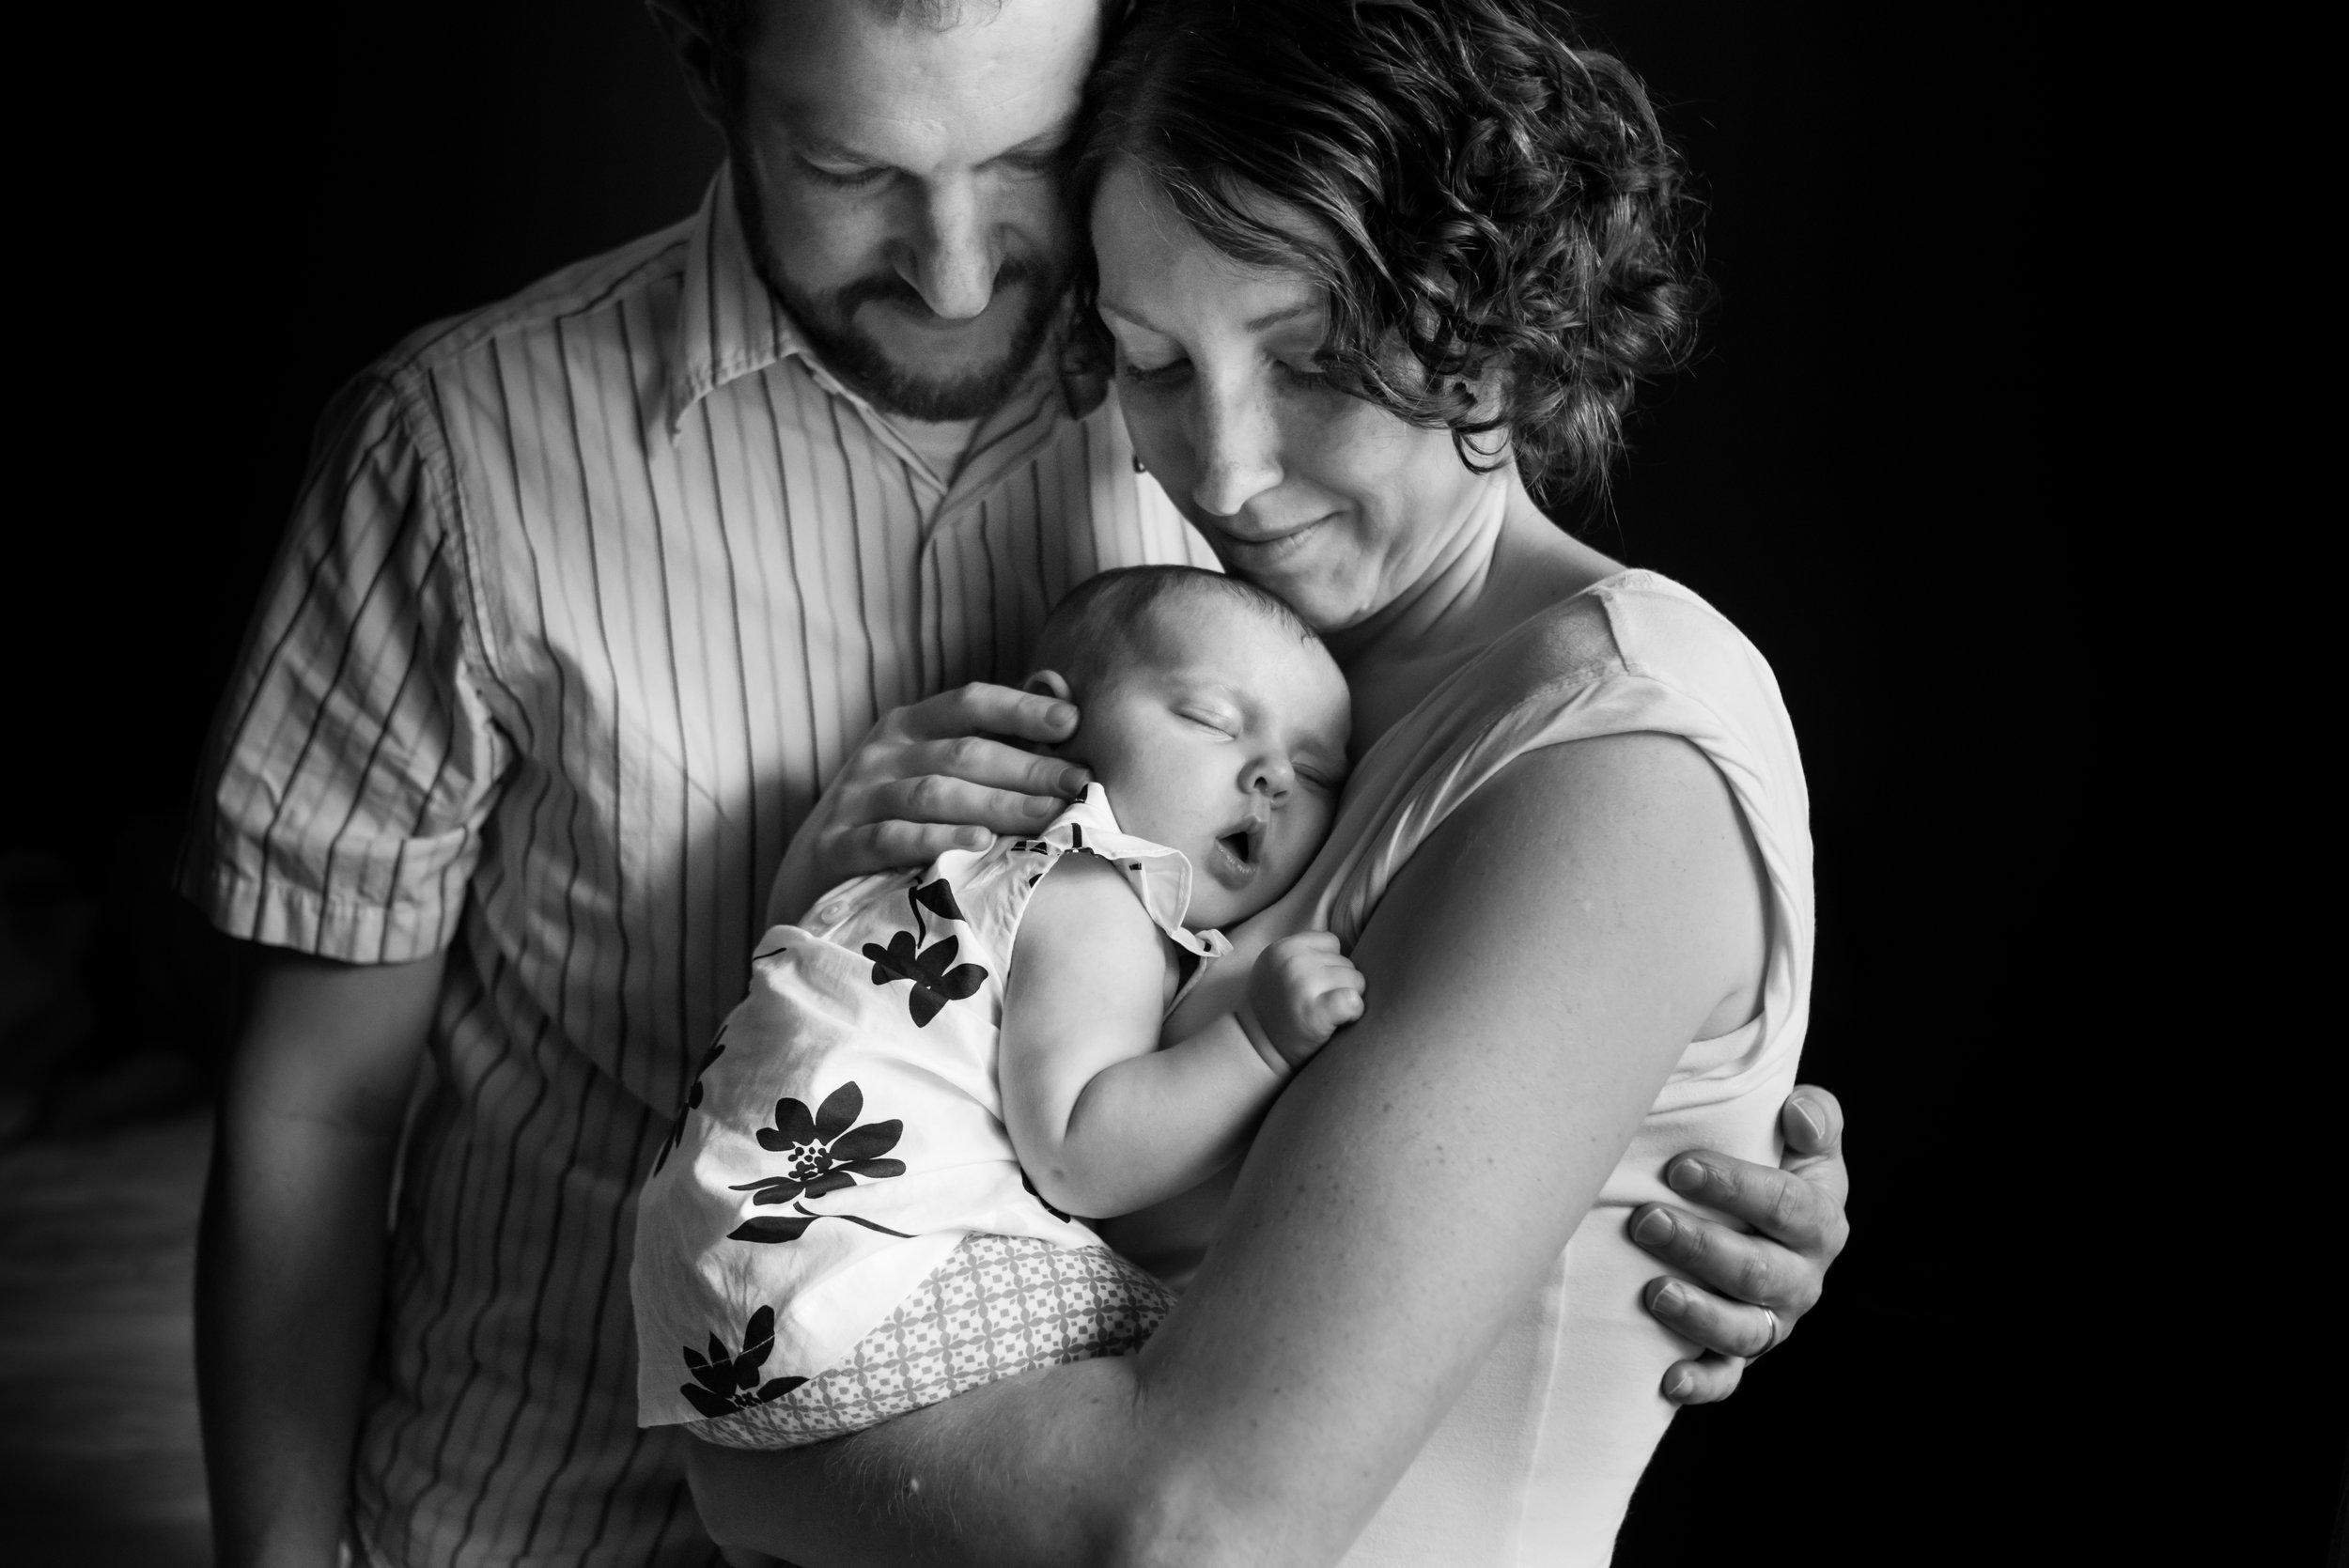 JuliaMatthewsPhotography_MadisonWisconsinFamilyPhotography_Newborn-11.jpg